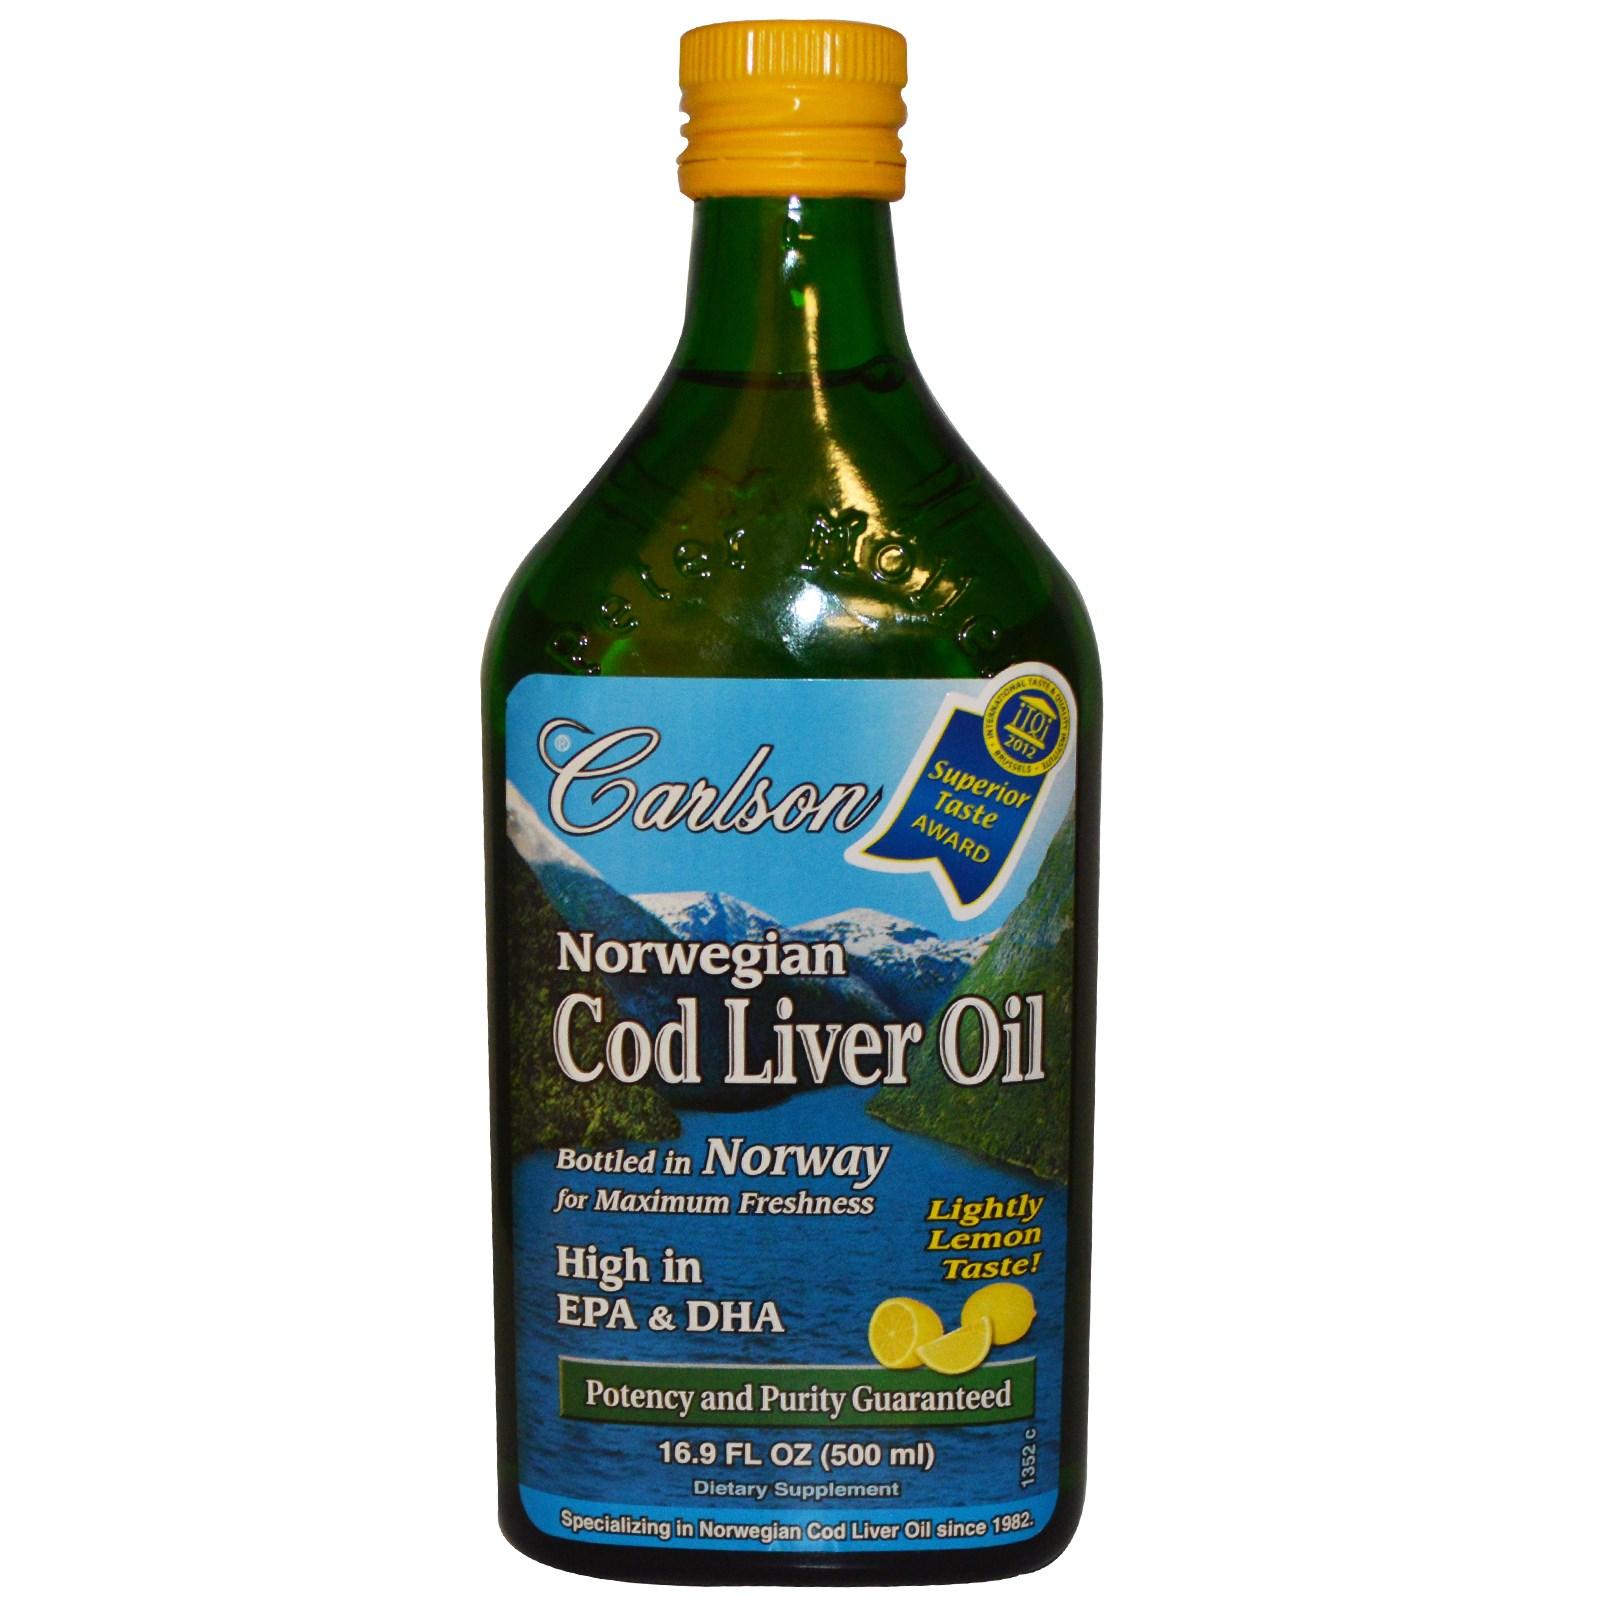 Nordic naturals arctic d cod liver oil vs carlson labs for Nordic naturals fish oil